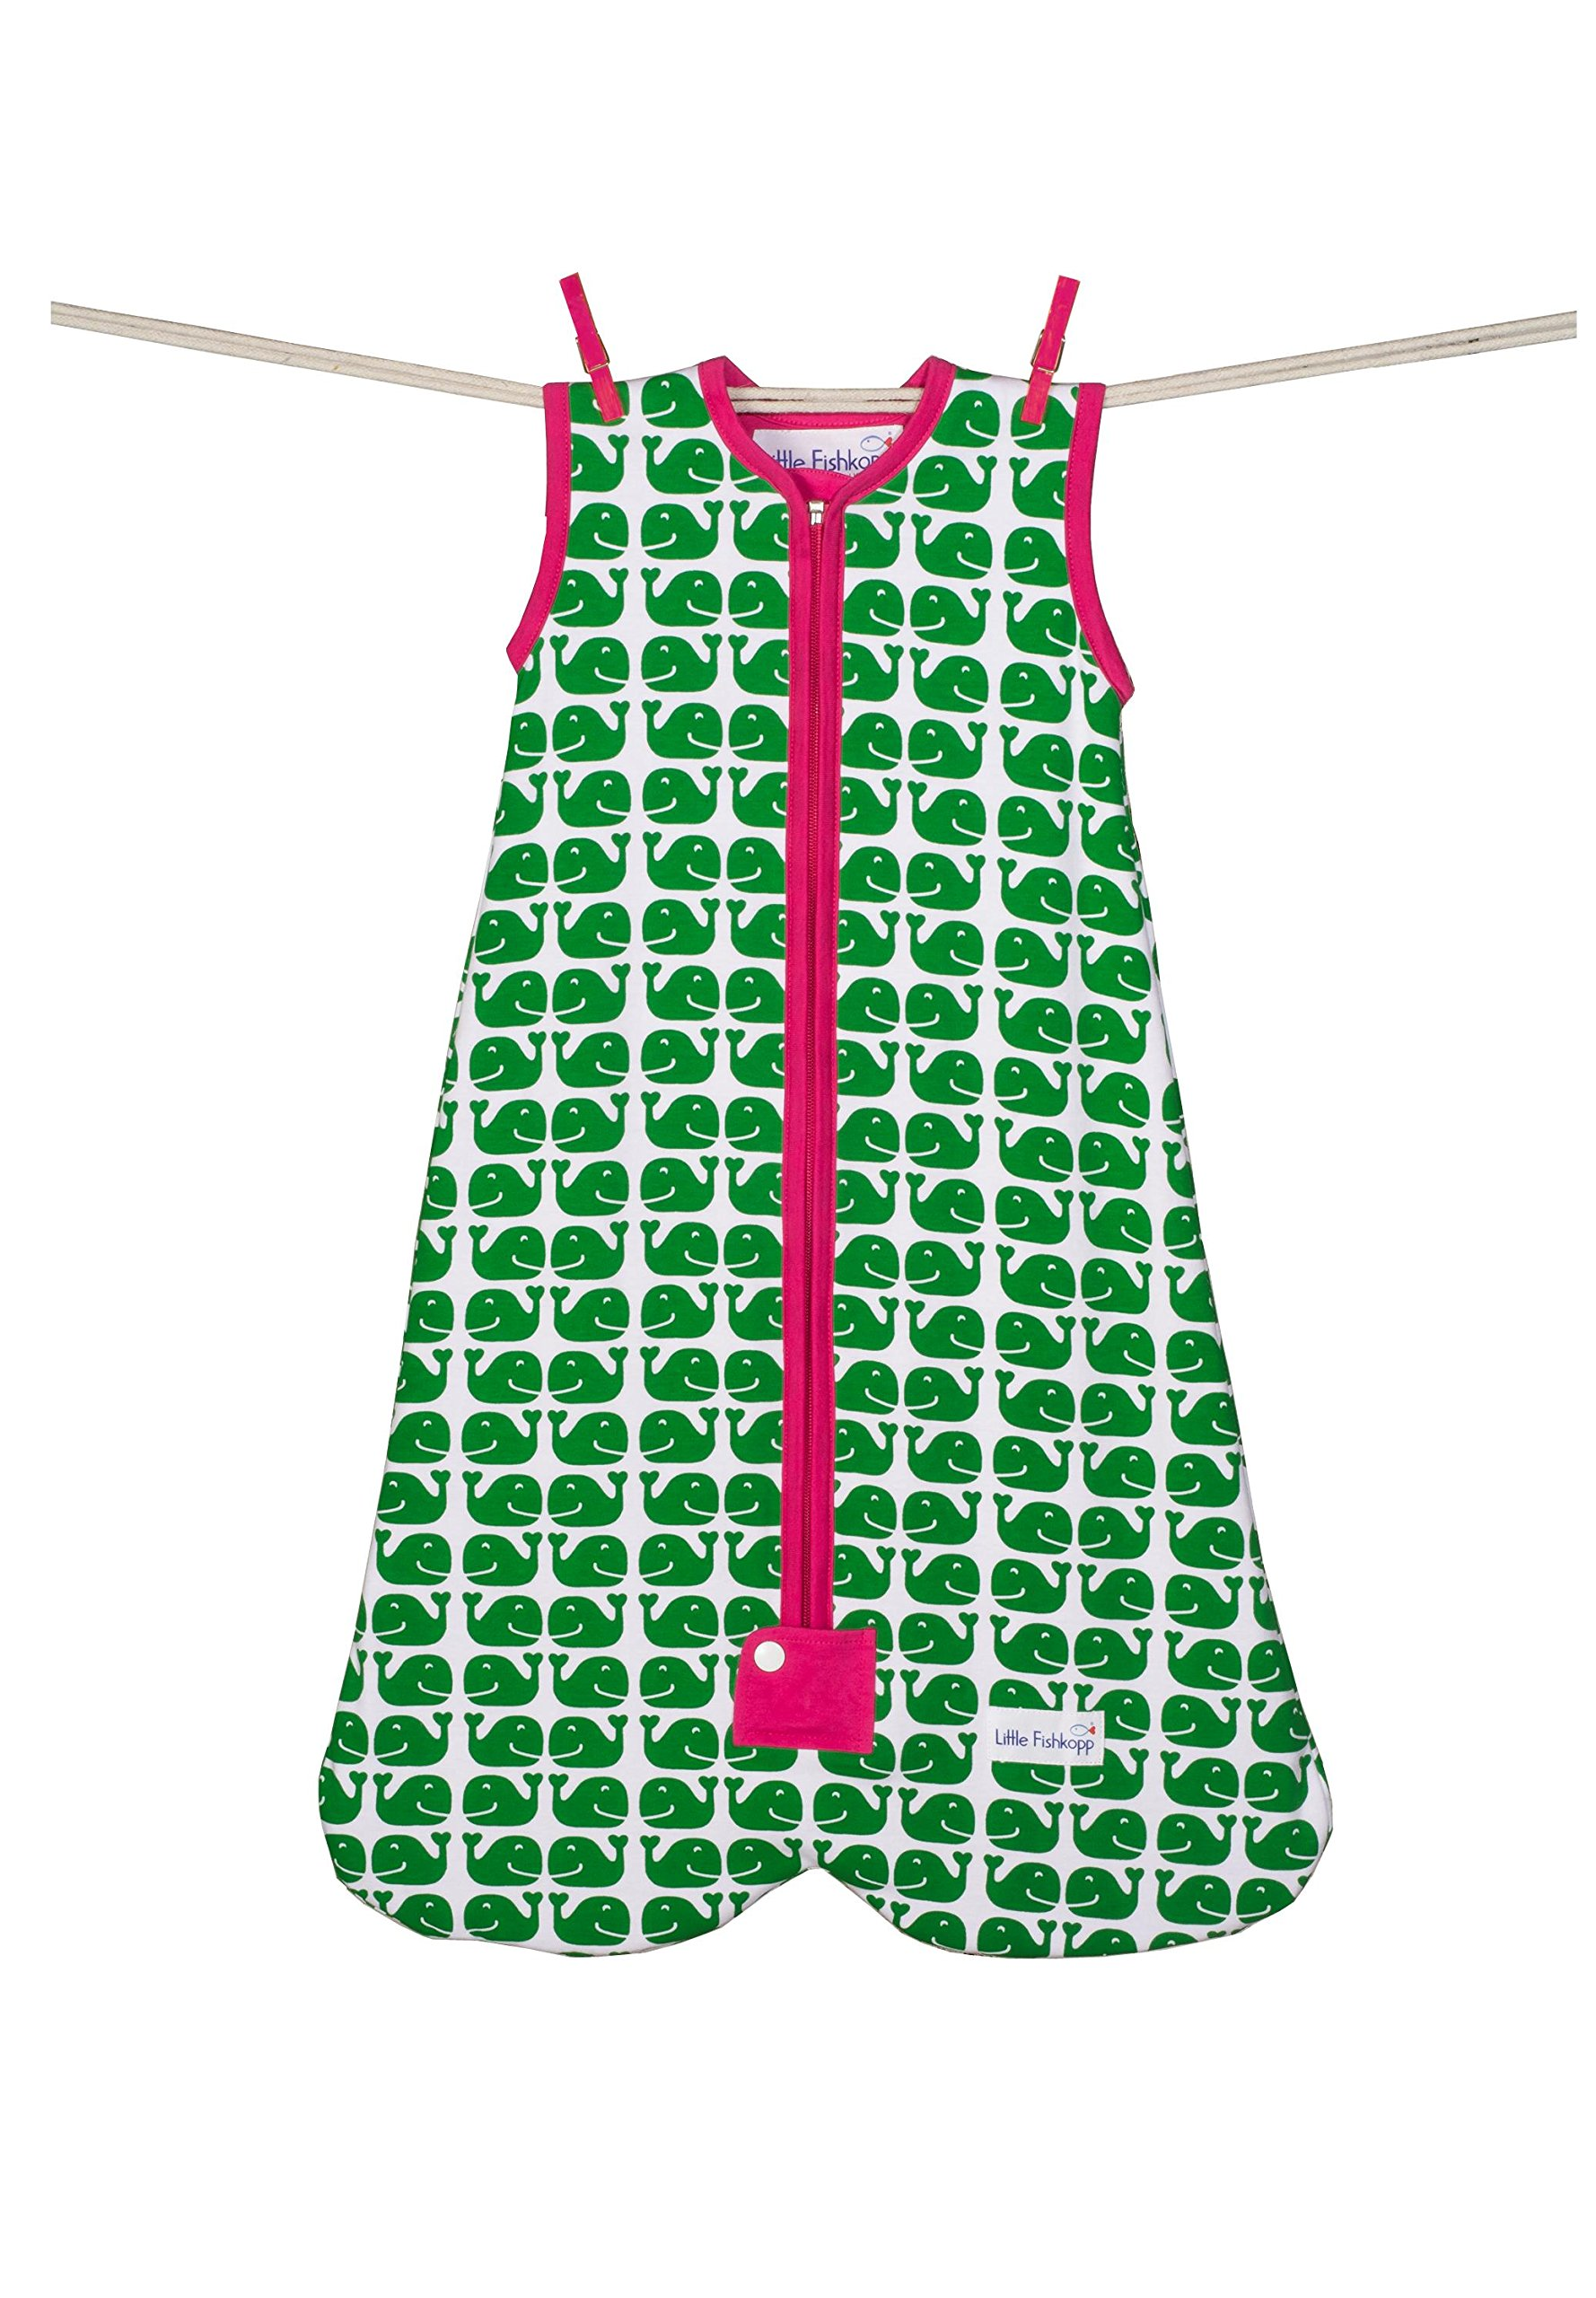 Little Fishkopp Organic Cotton Baby Sleep Bag, Whales, 1.0 Tog, Green, Medium